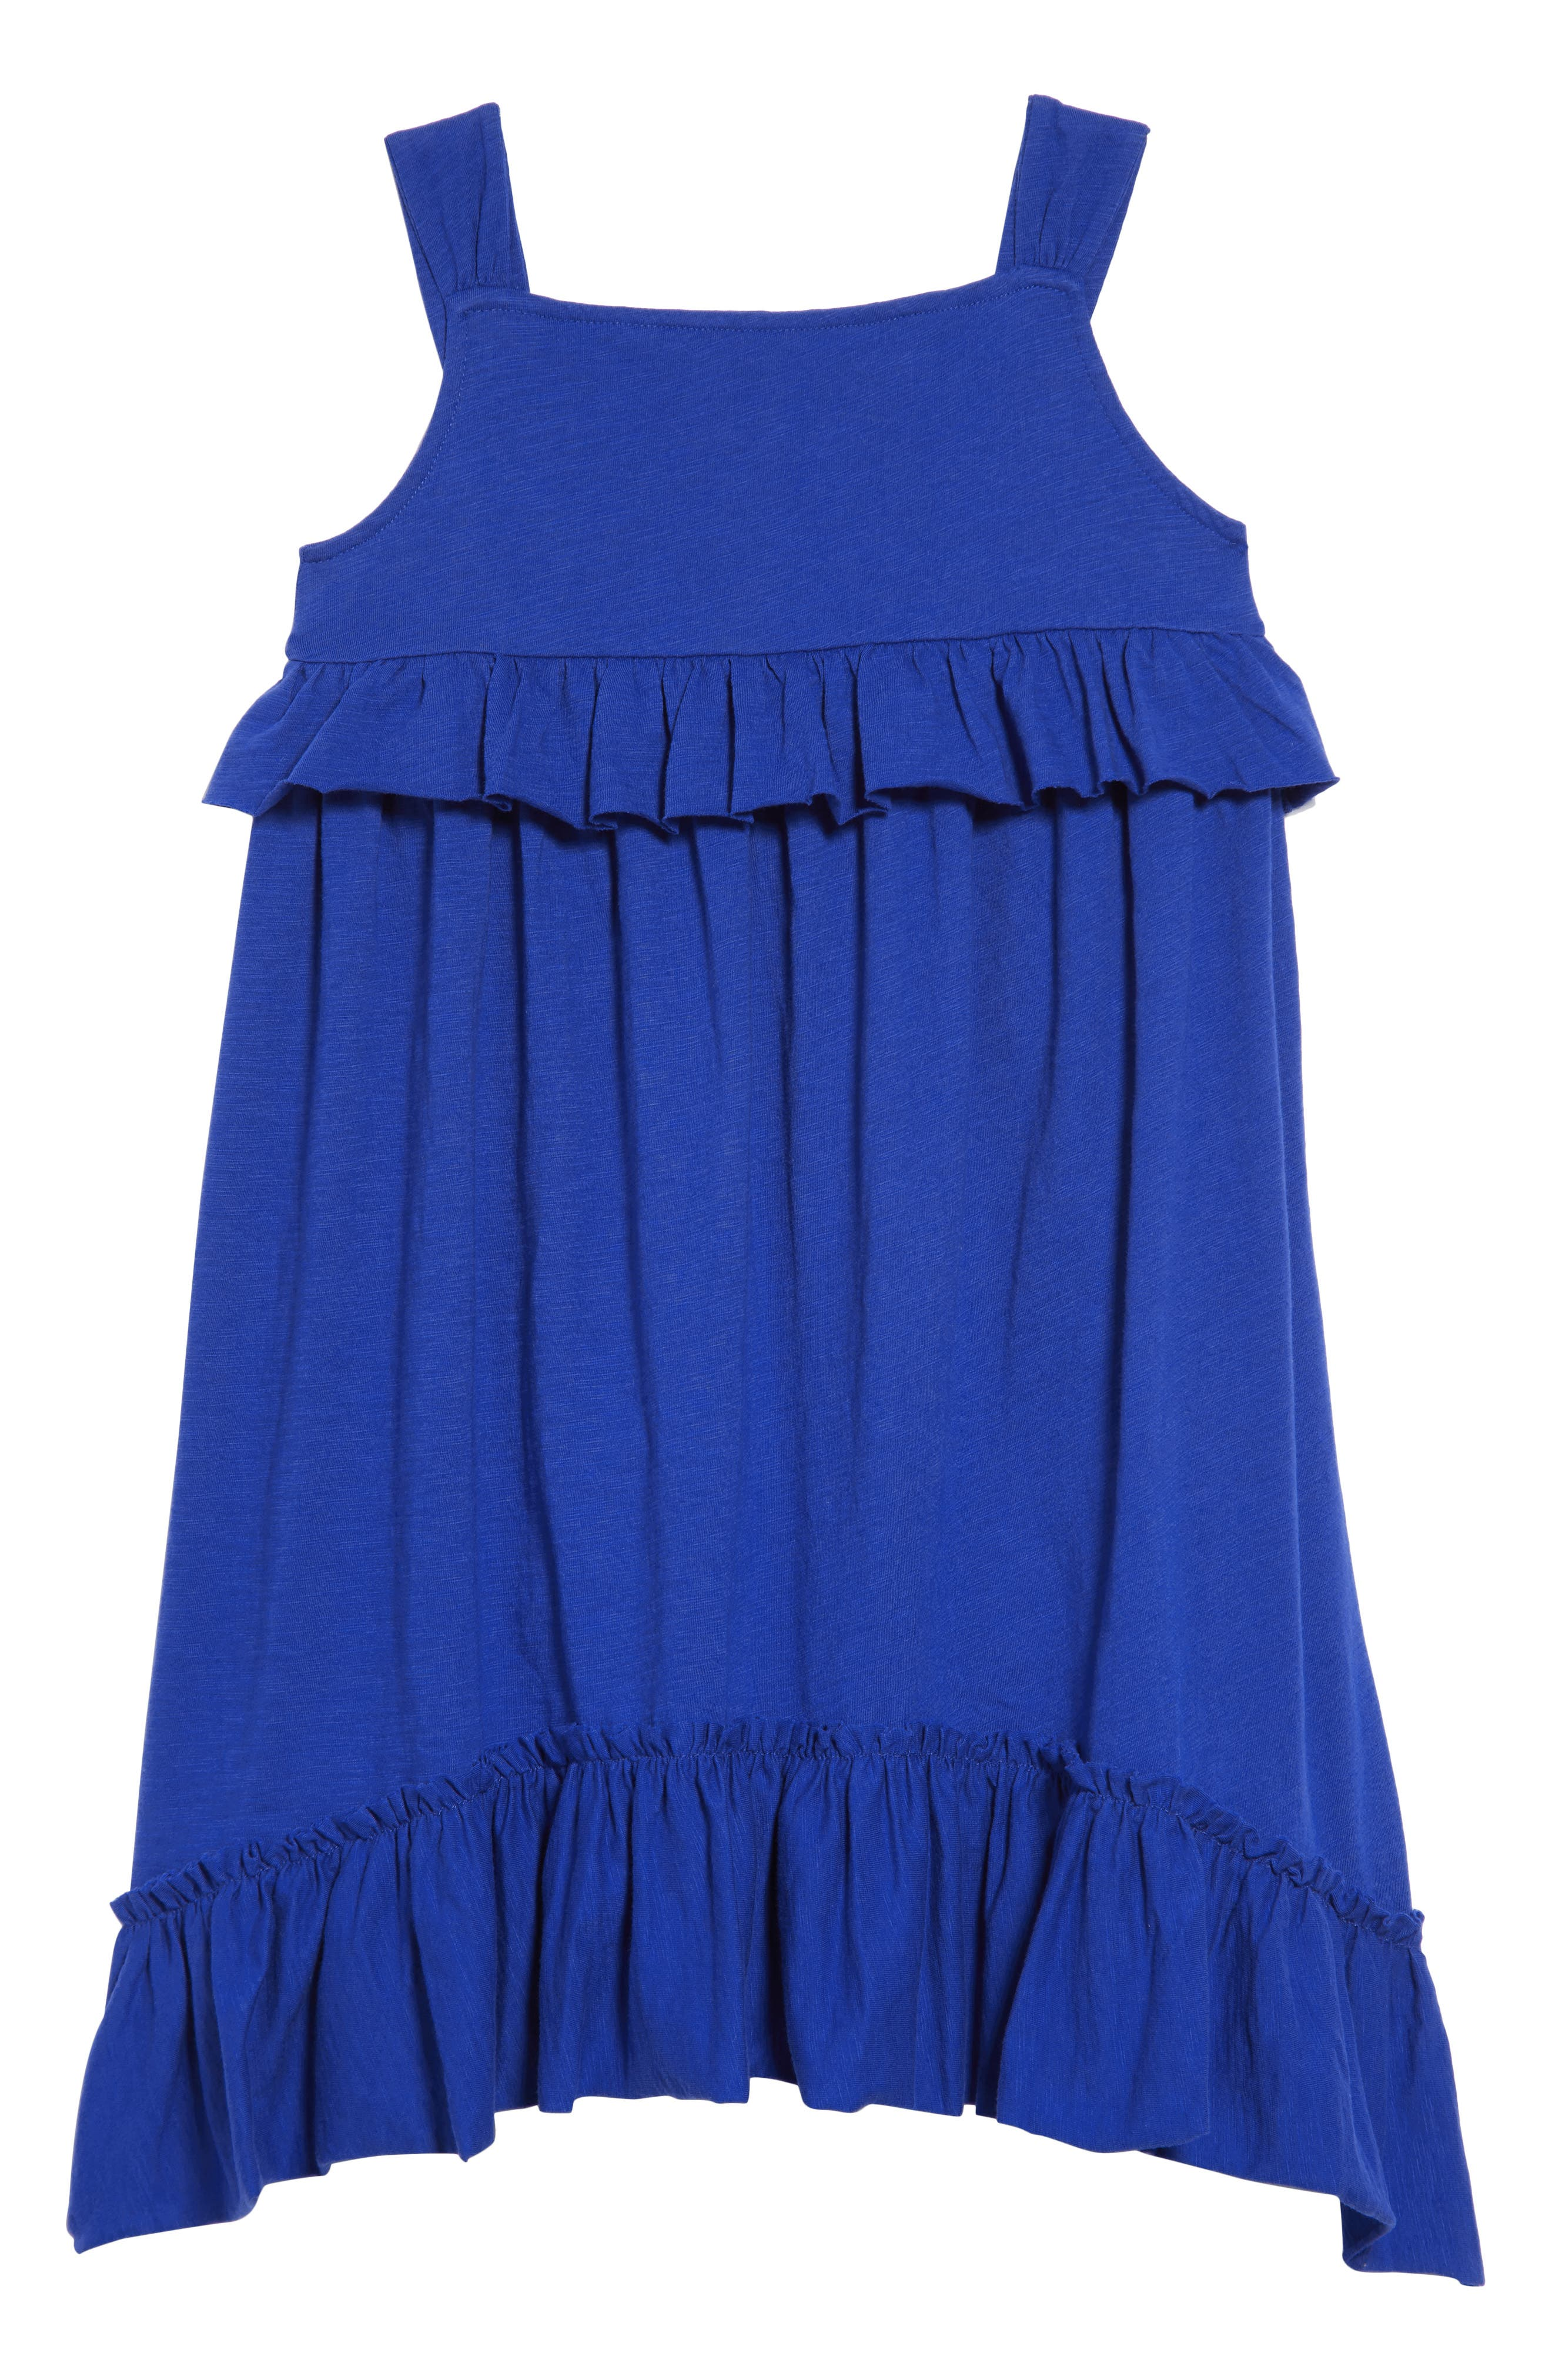 CREWCUTS BY J.CREW,                             Mimi Ruffle Dress,                             Main thumbnail 1, color,                             400